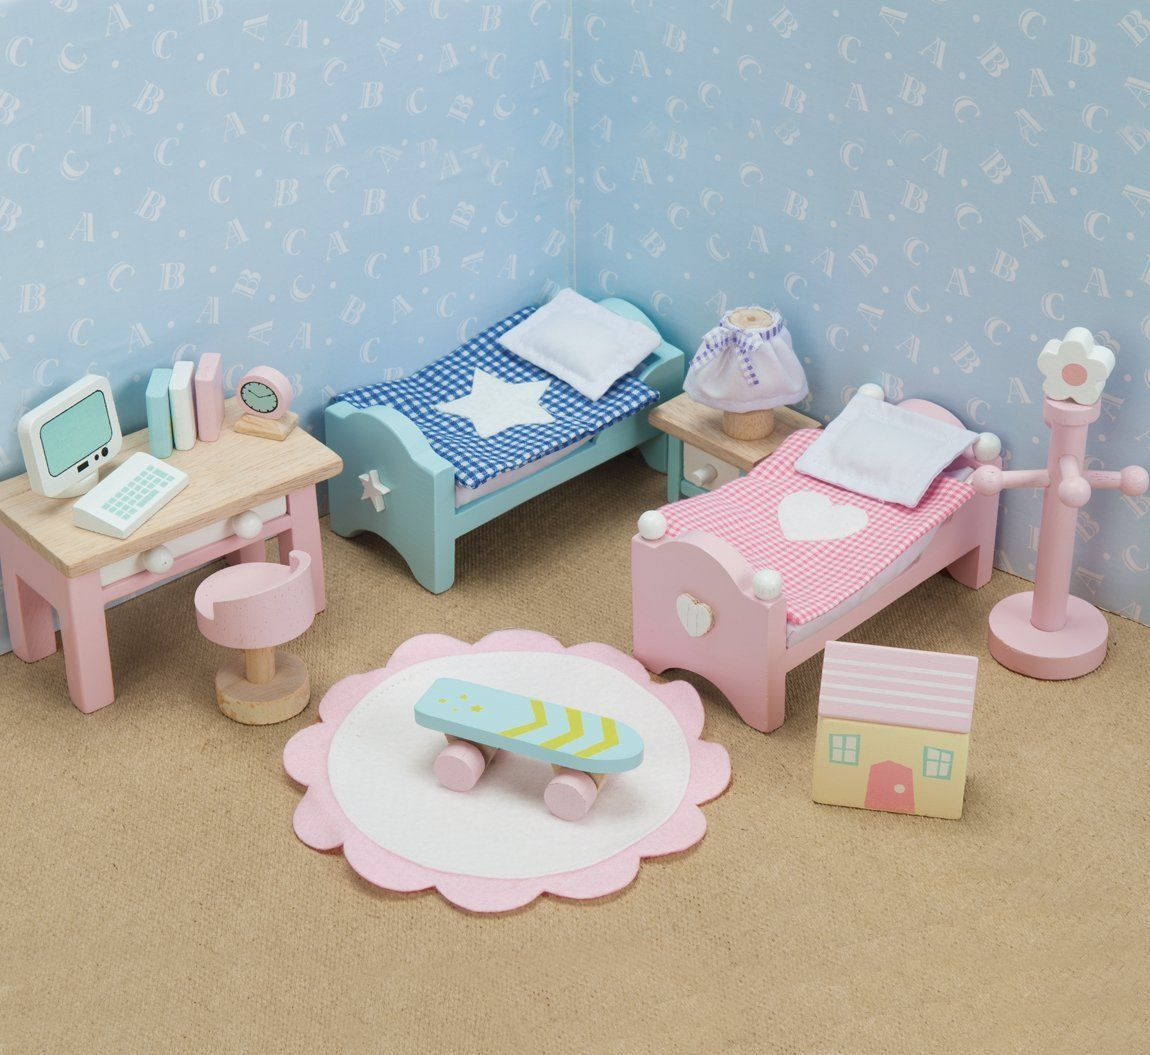 Casa de Muñecas Madera Le Toy Van Cherry con Muebles 6 Set Daisylane ...